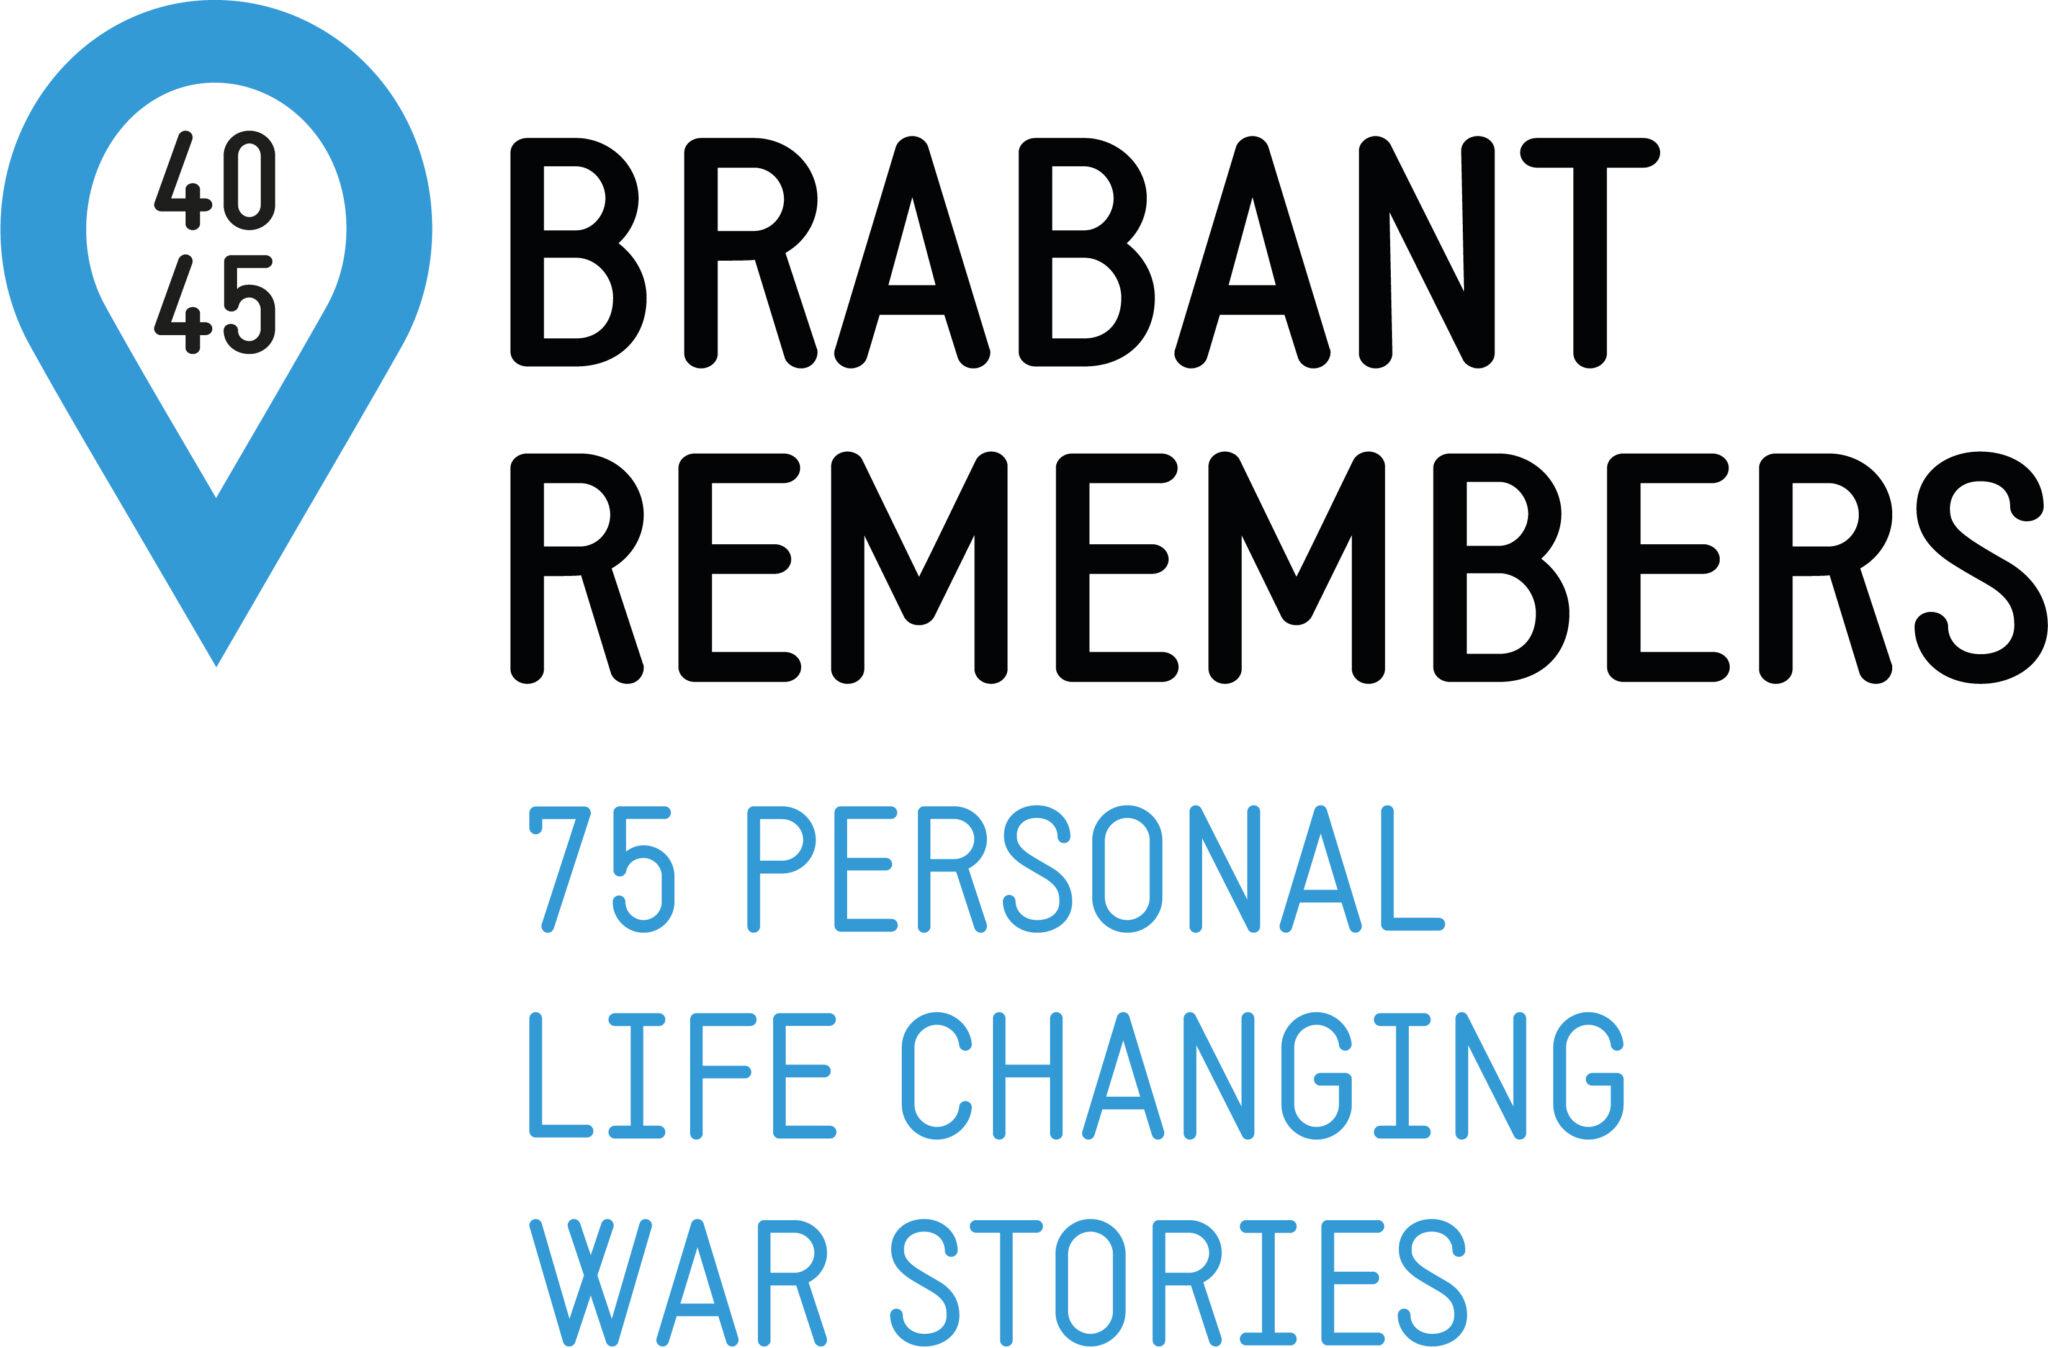 Brabant Remembers